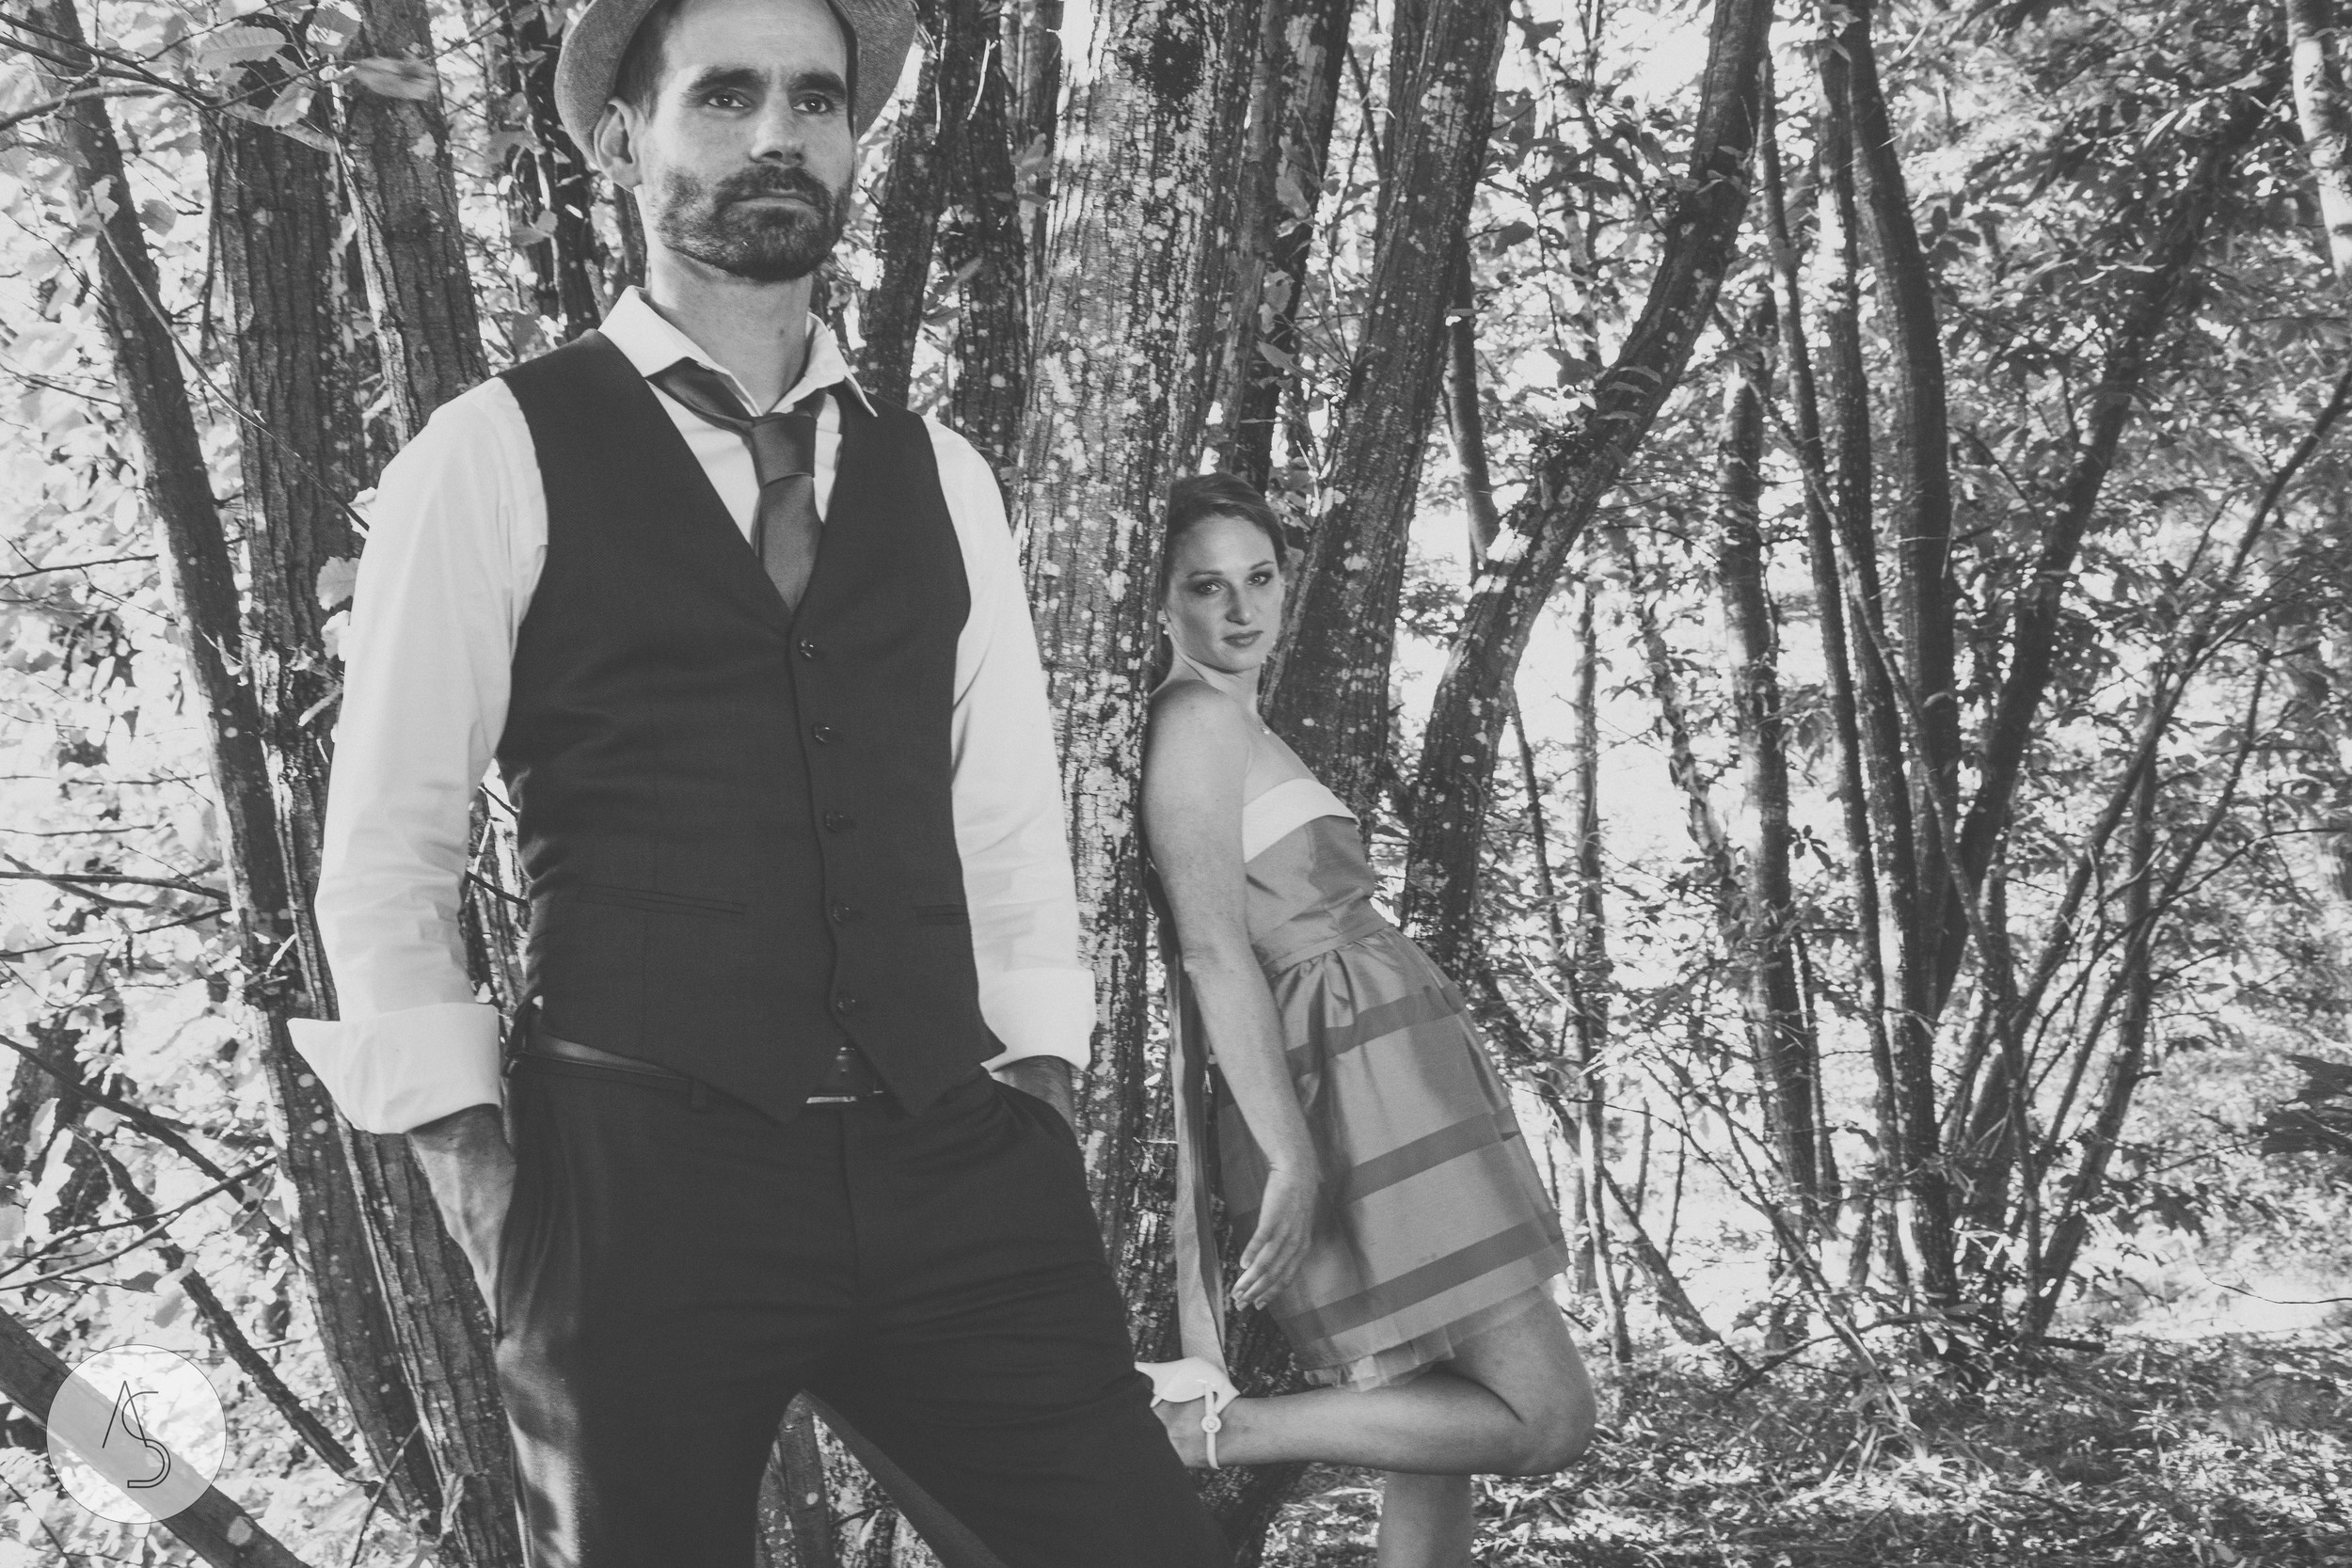 photographe mariage - Grenoble - Rhone Alpes - Adriana Salazar photo-96.jpg